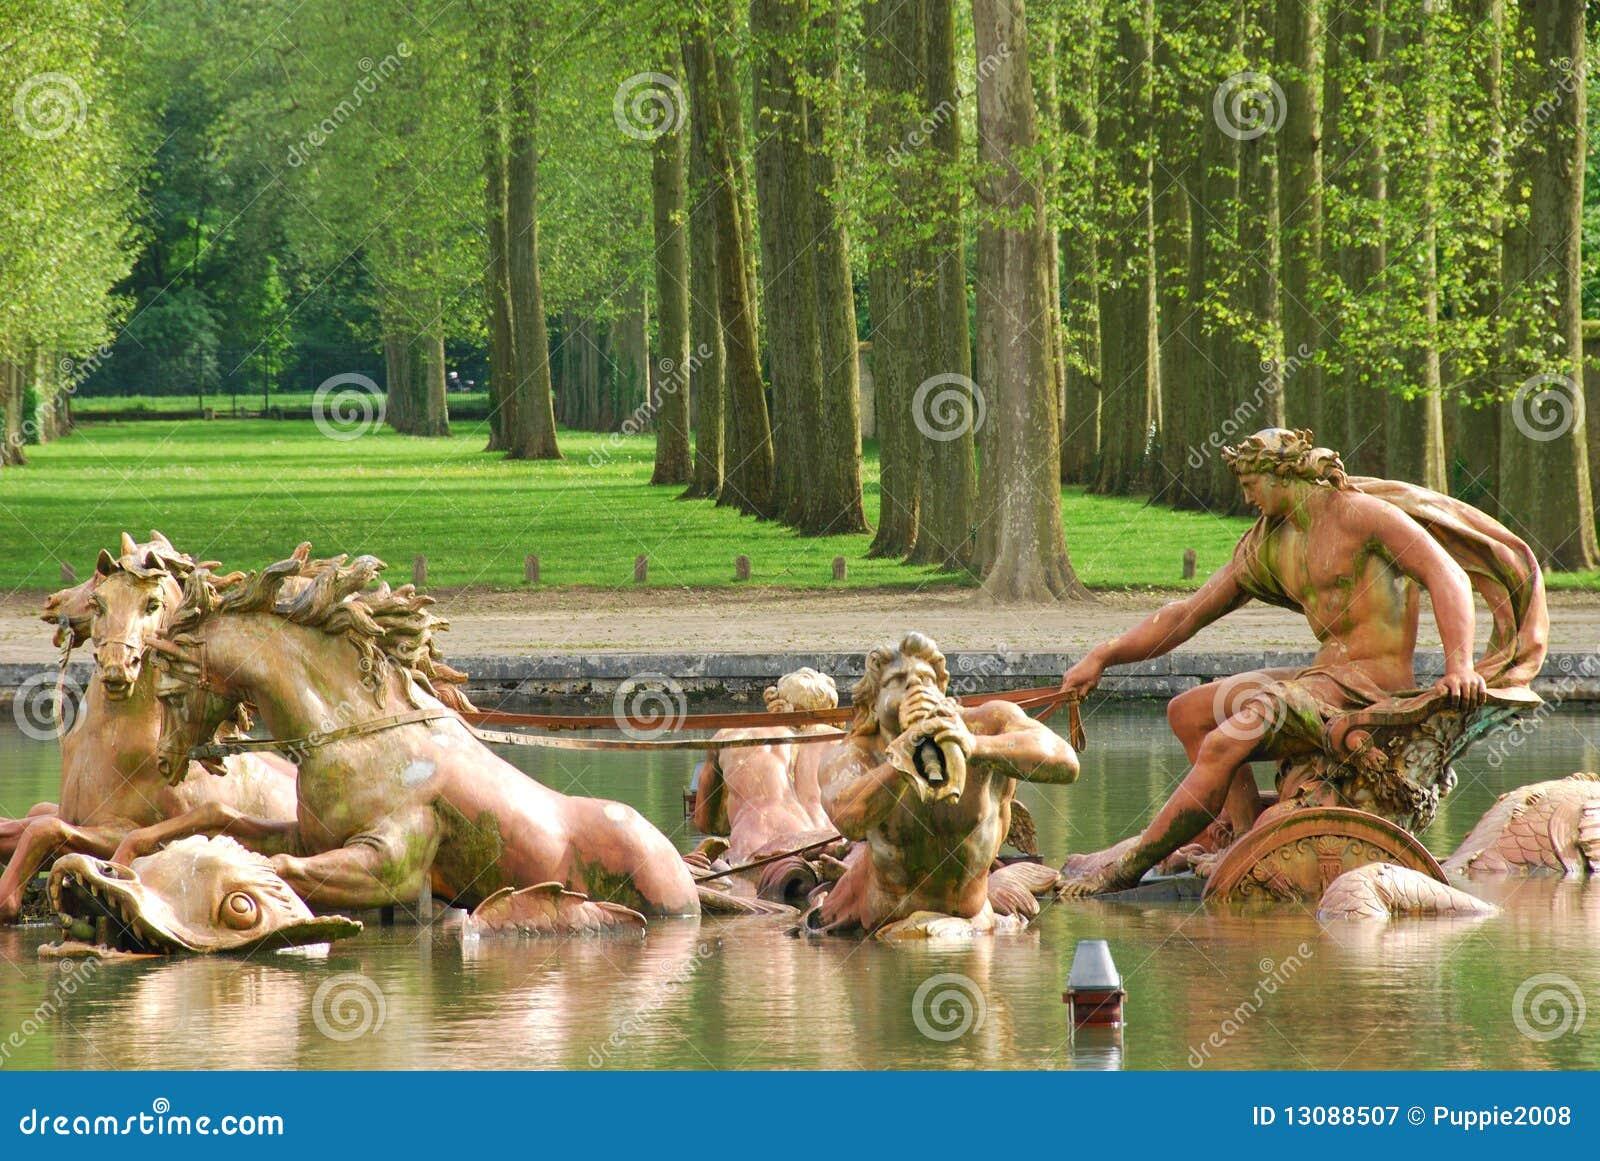 Fonte de Apollo no palácio de Versalhes